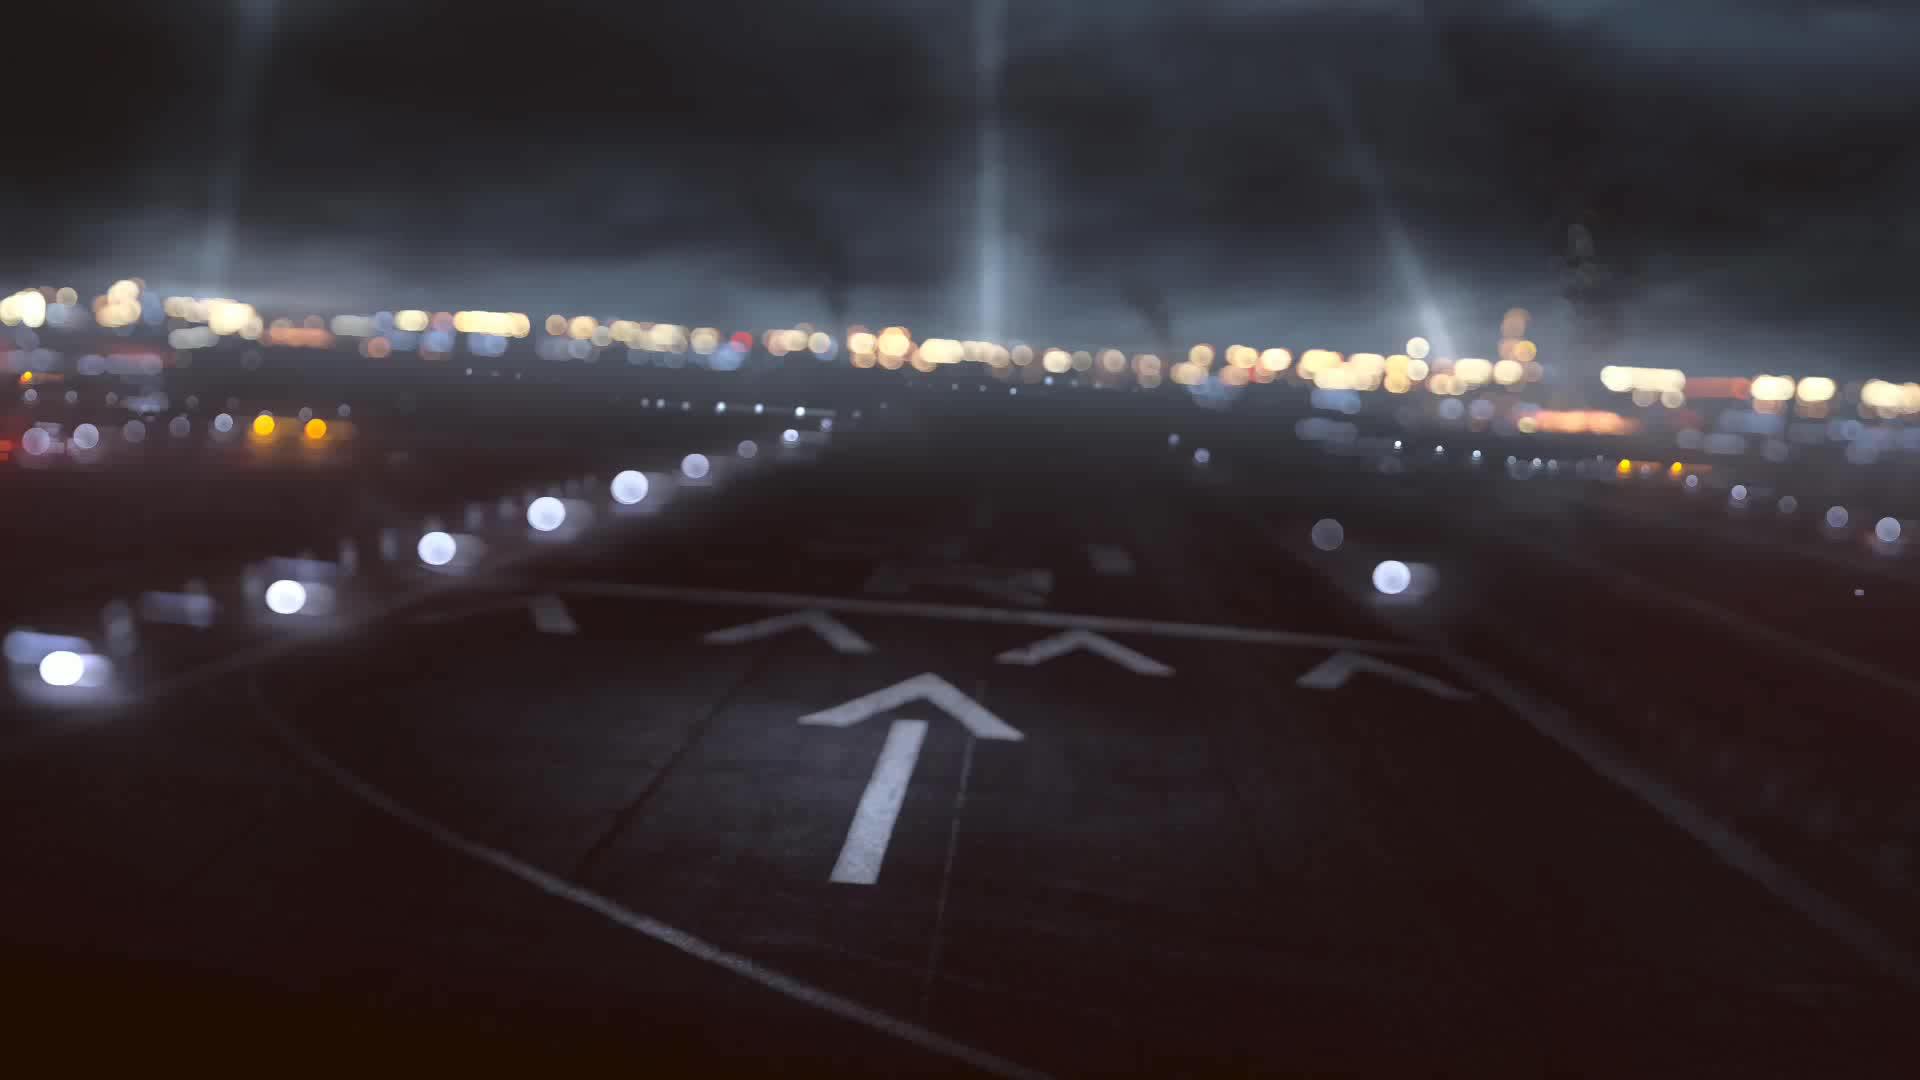 battlefield 4, bf4, Battlefield 4 GIFs